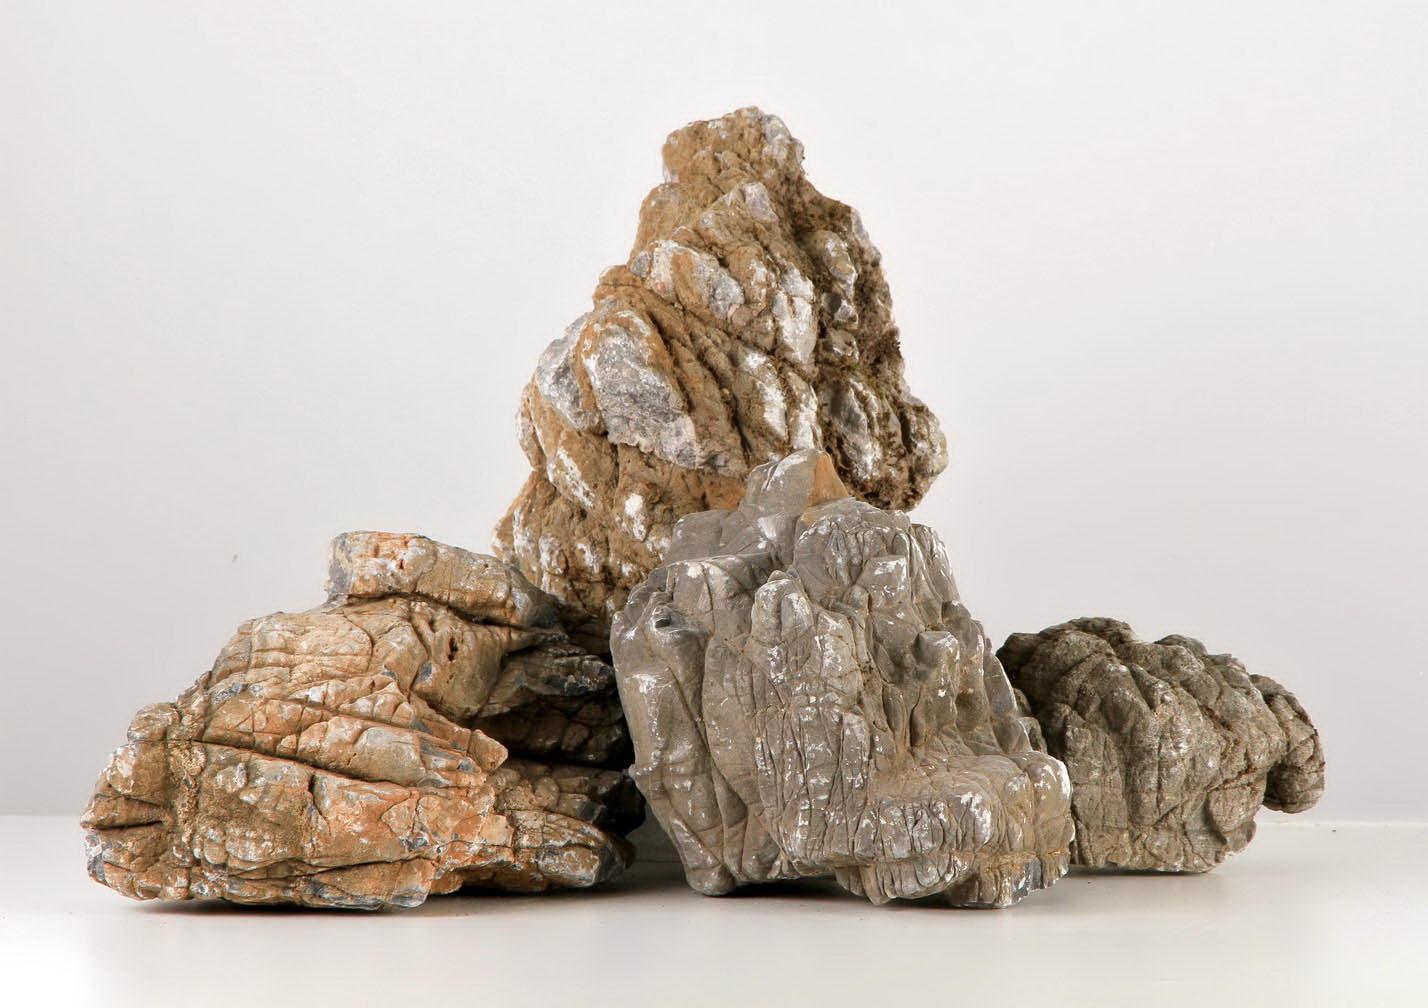 aquascaping-steine-01.jpg